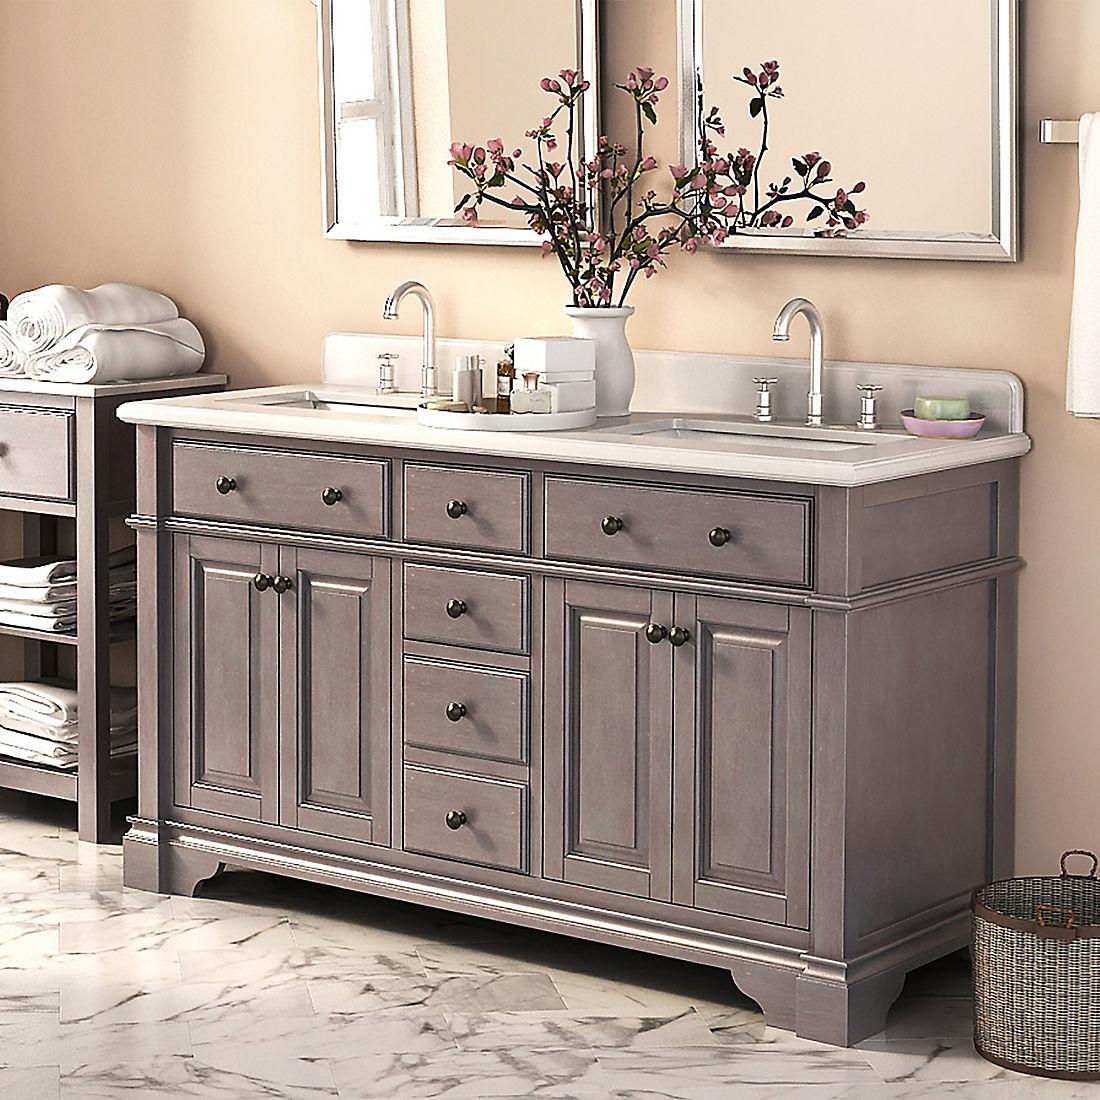 Lanza Casanova 60 Double Sink Vanity Antique Gray Bjs Wholesale Club